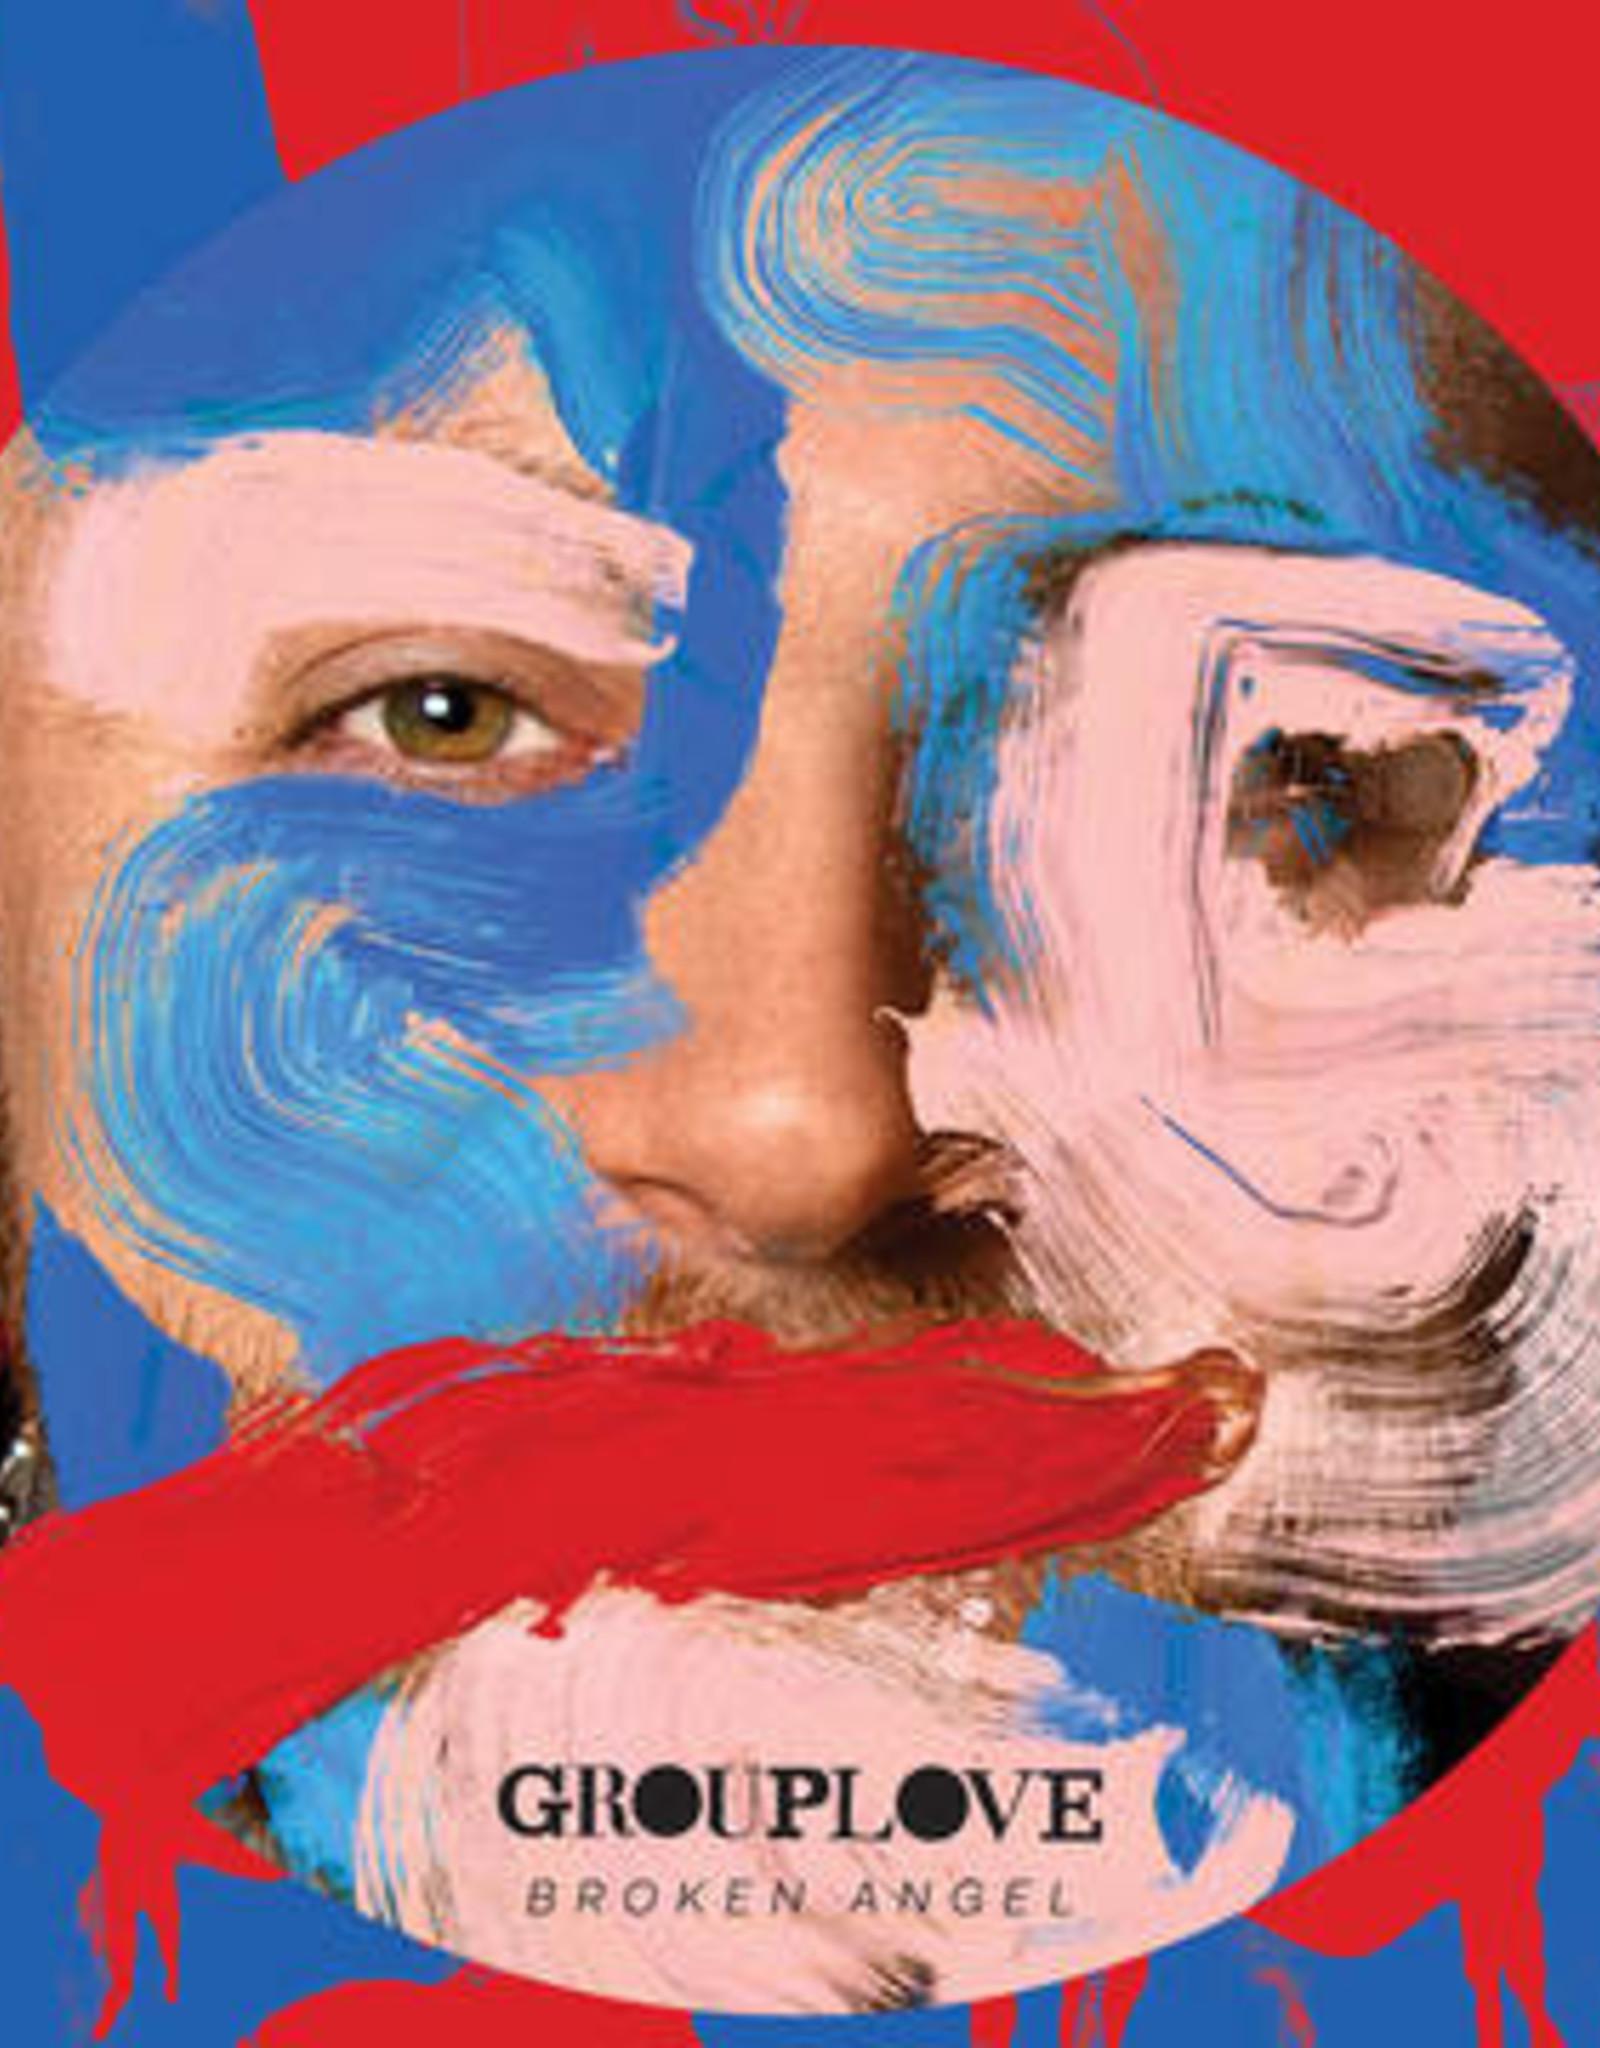 Grouplove - Broken Angel (PICTURE Disc) (RSD 2020)